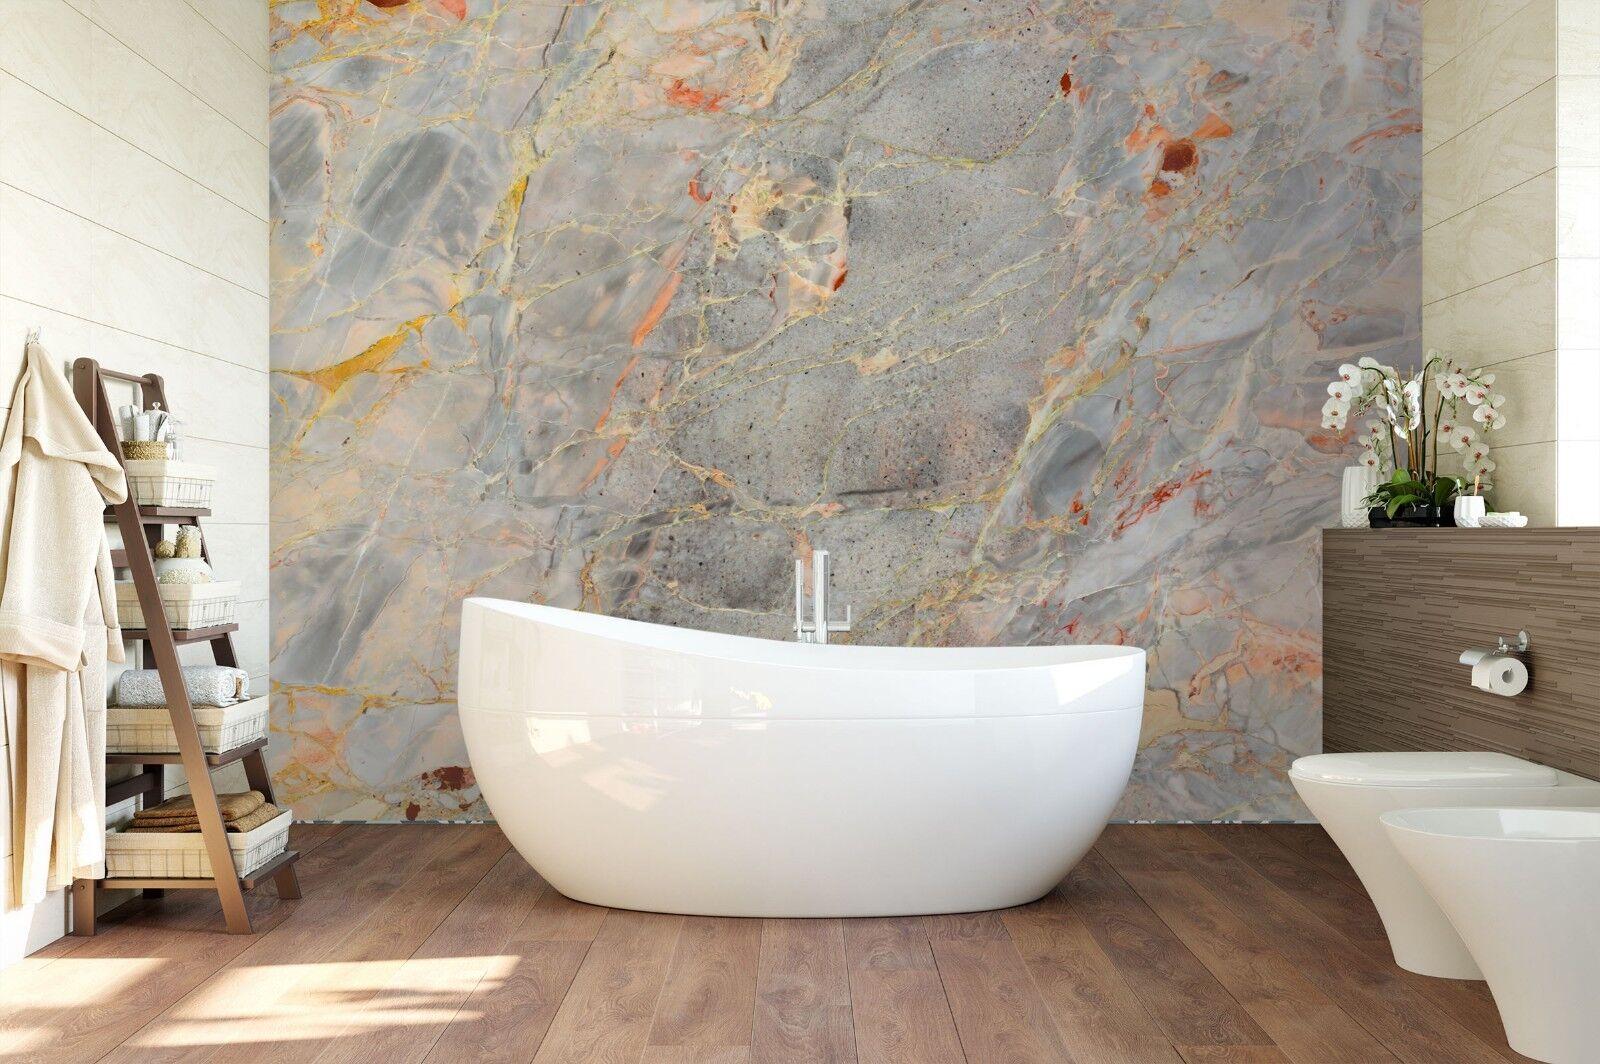 3D Variegated Jade 5237 Texture Tiles Marble Wall Paper Decal Wallpaper Mural